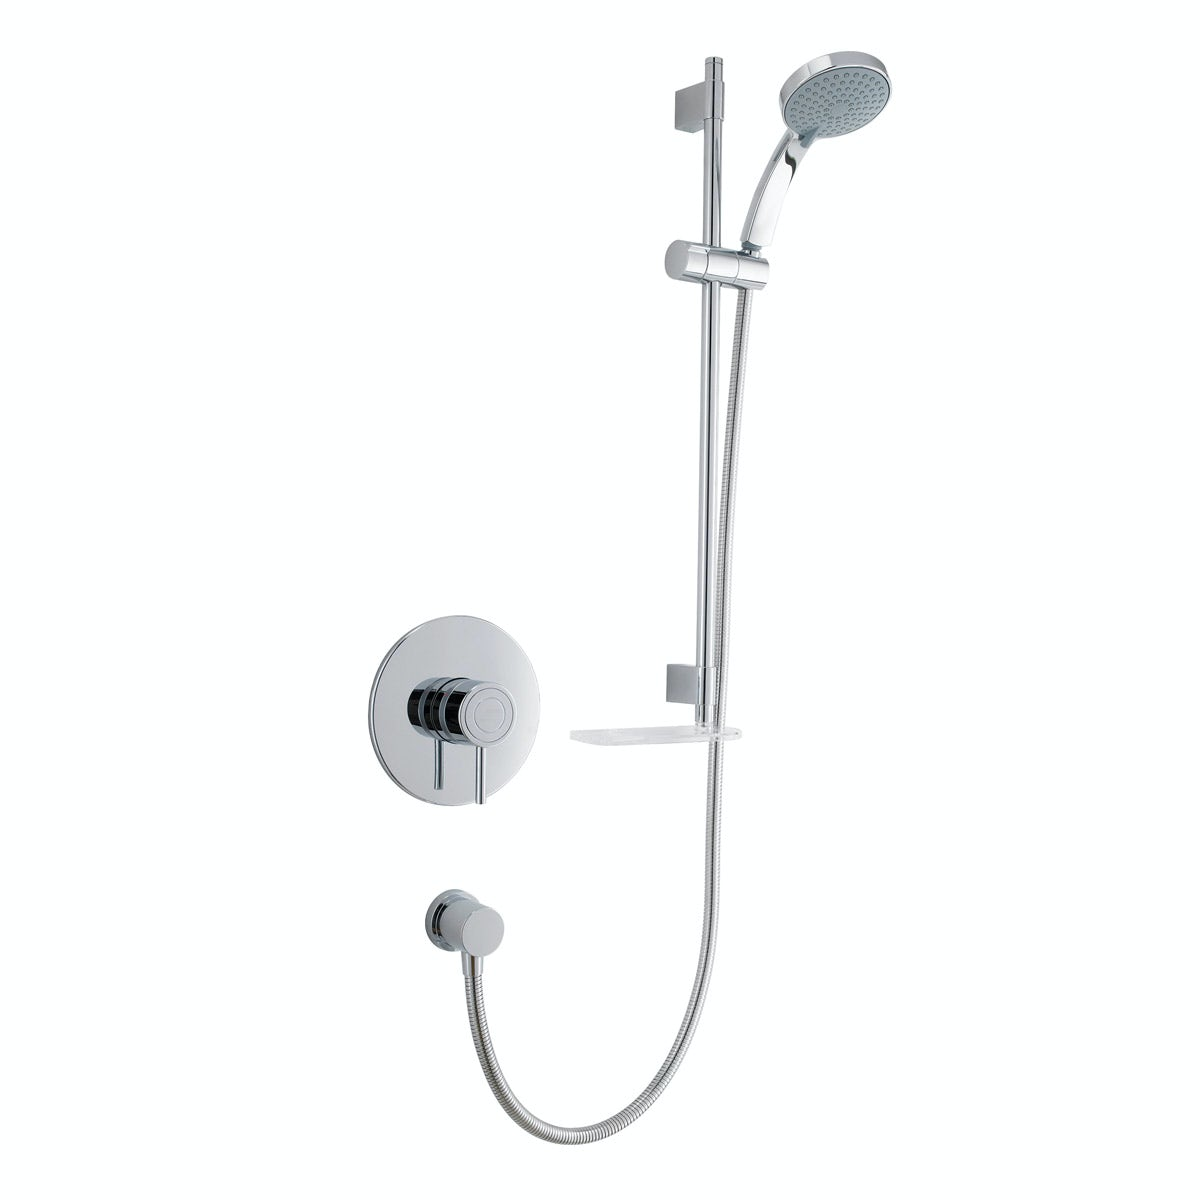 Mira Element SLT BIV thermostatic mixer shower